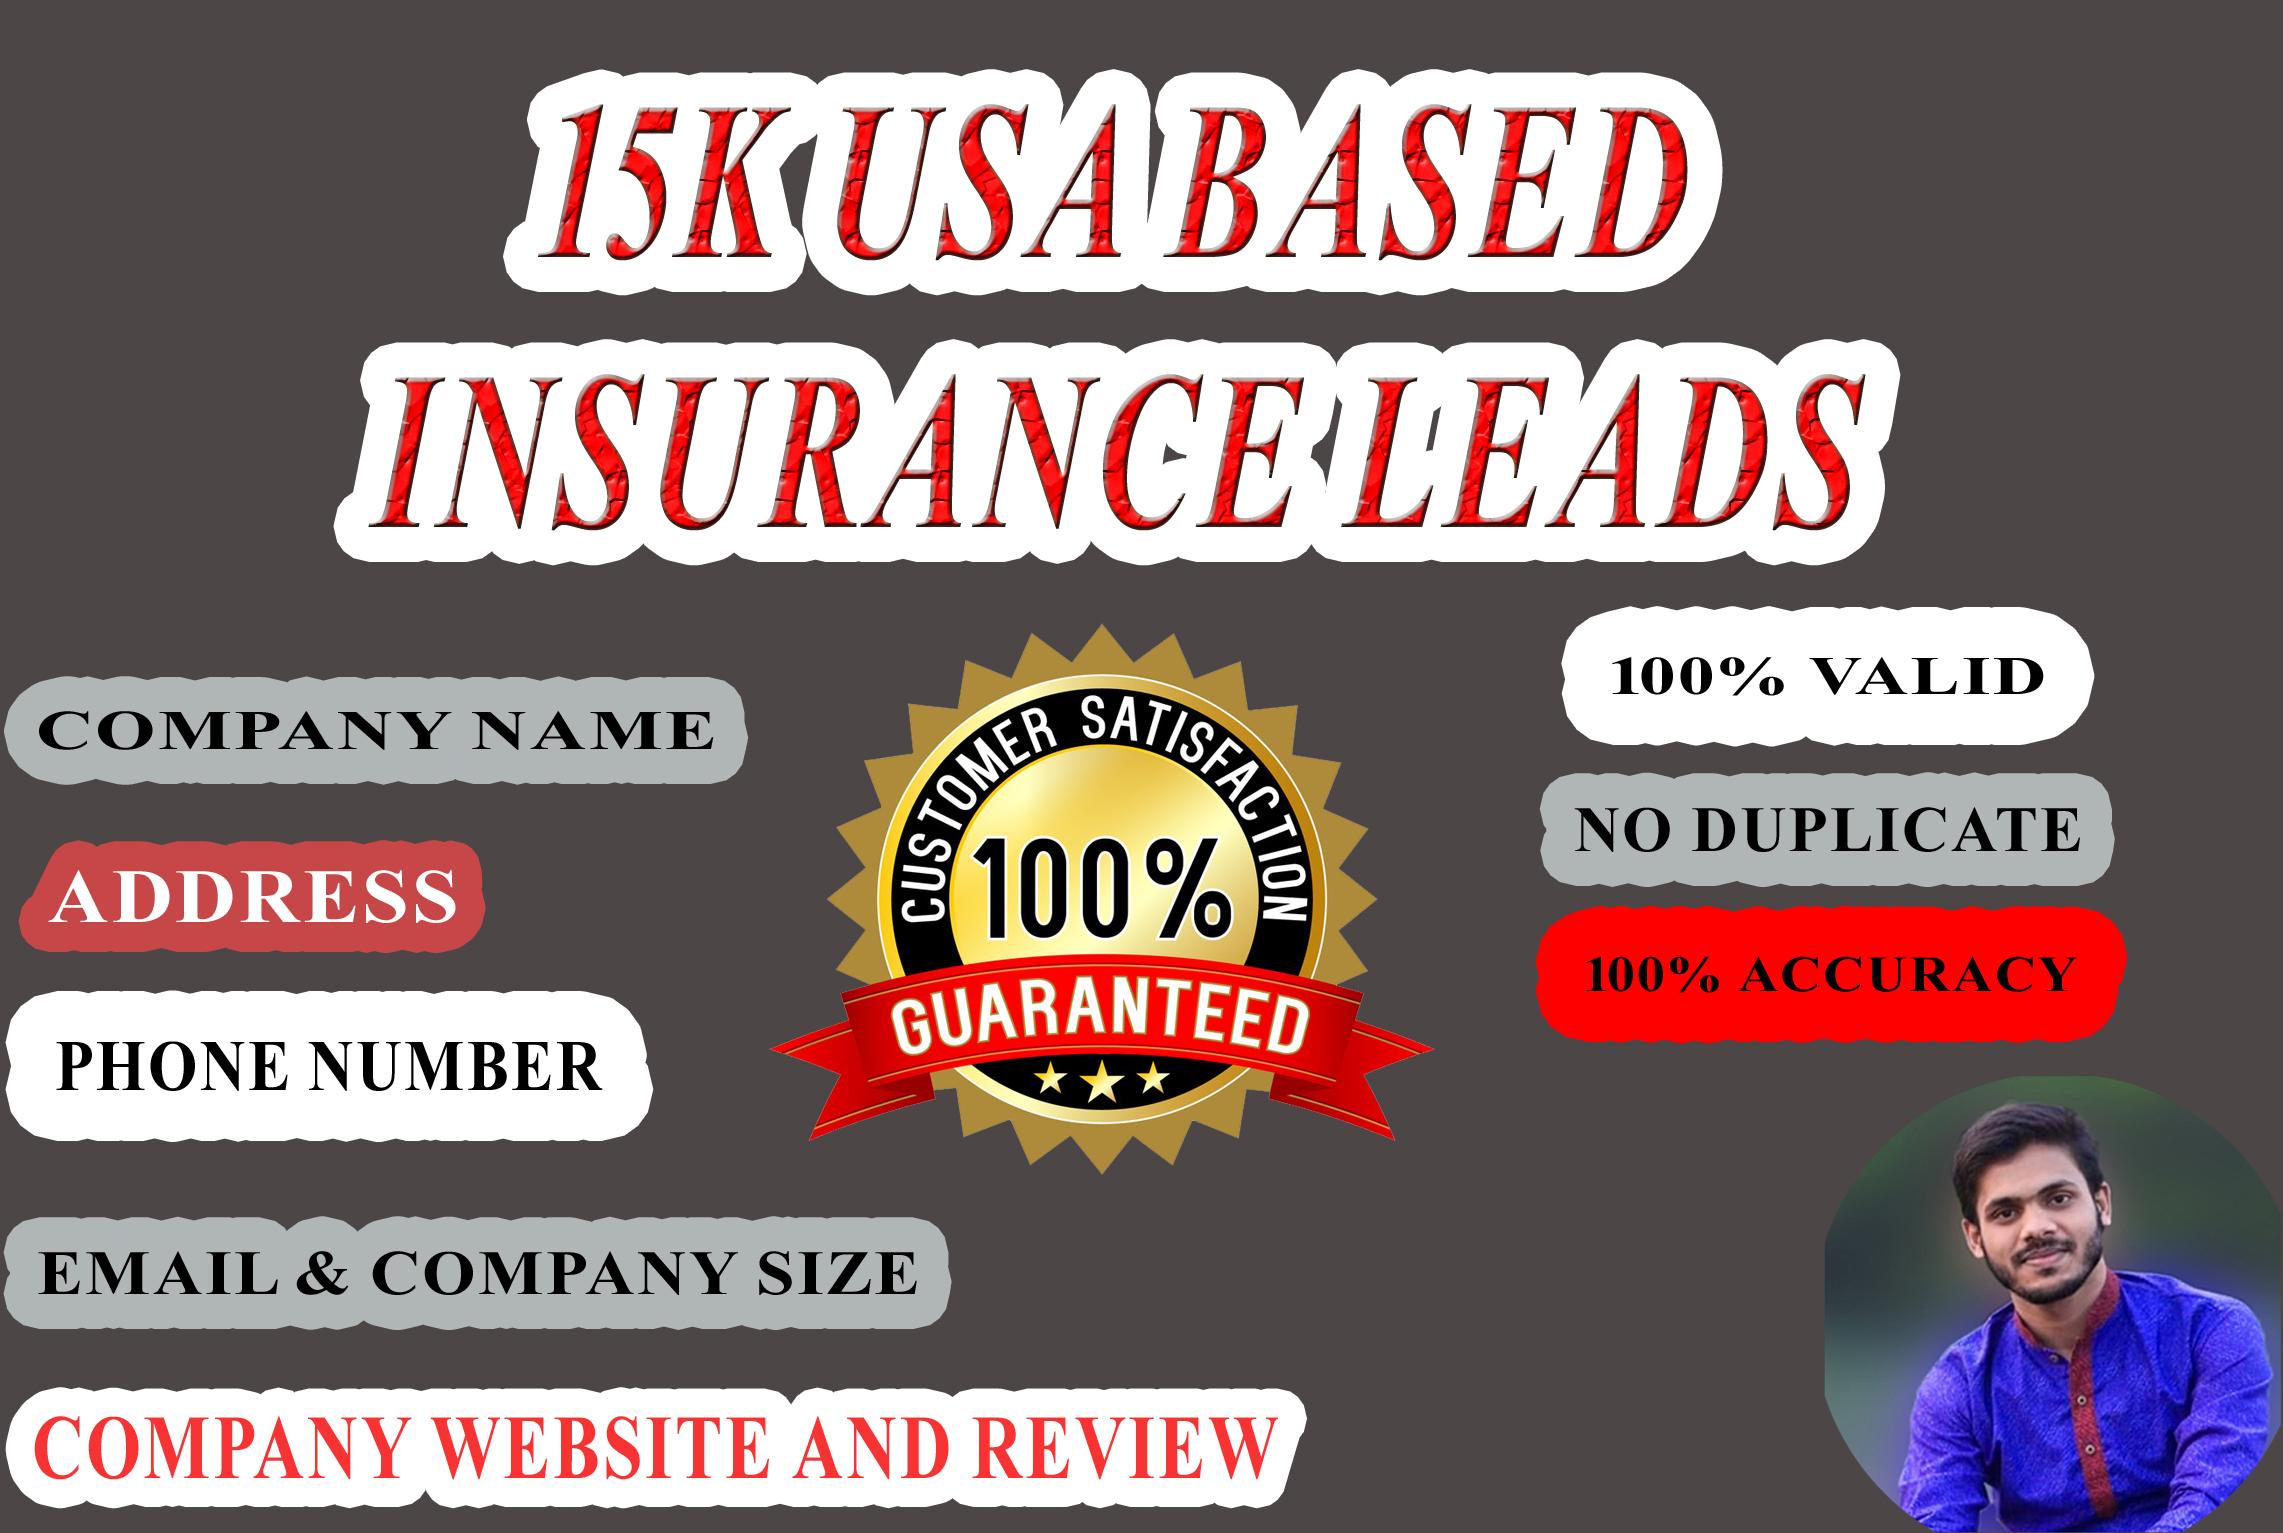 I will provide you 15k USA based Insurance Leads